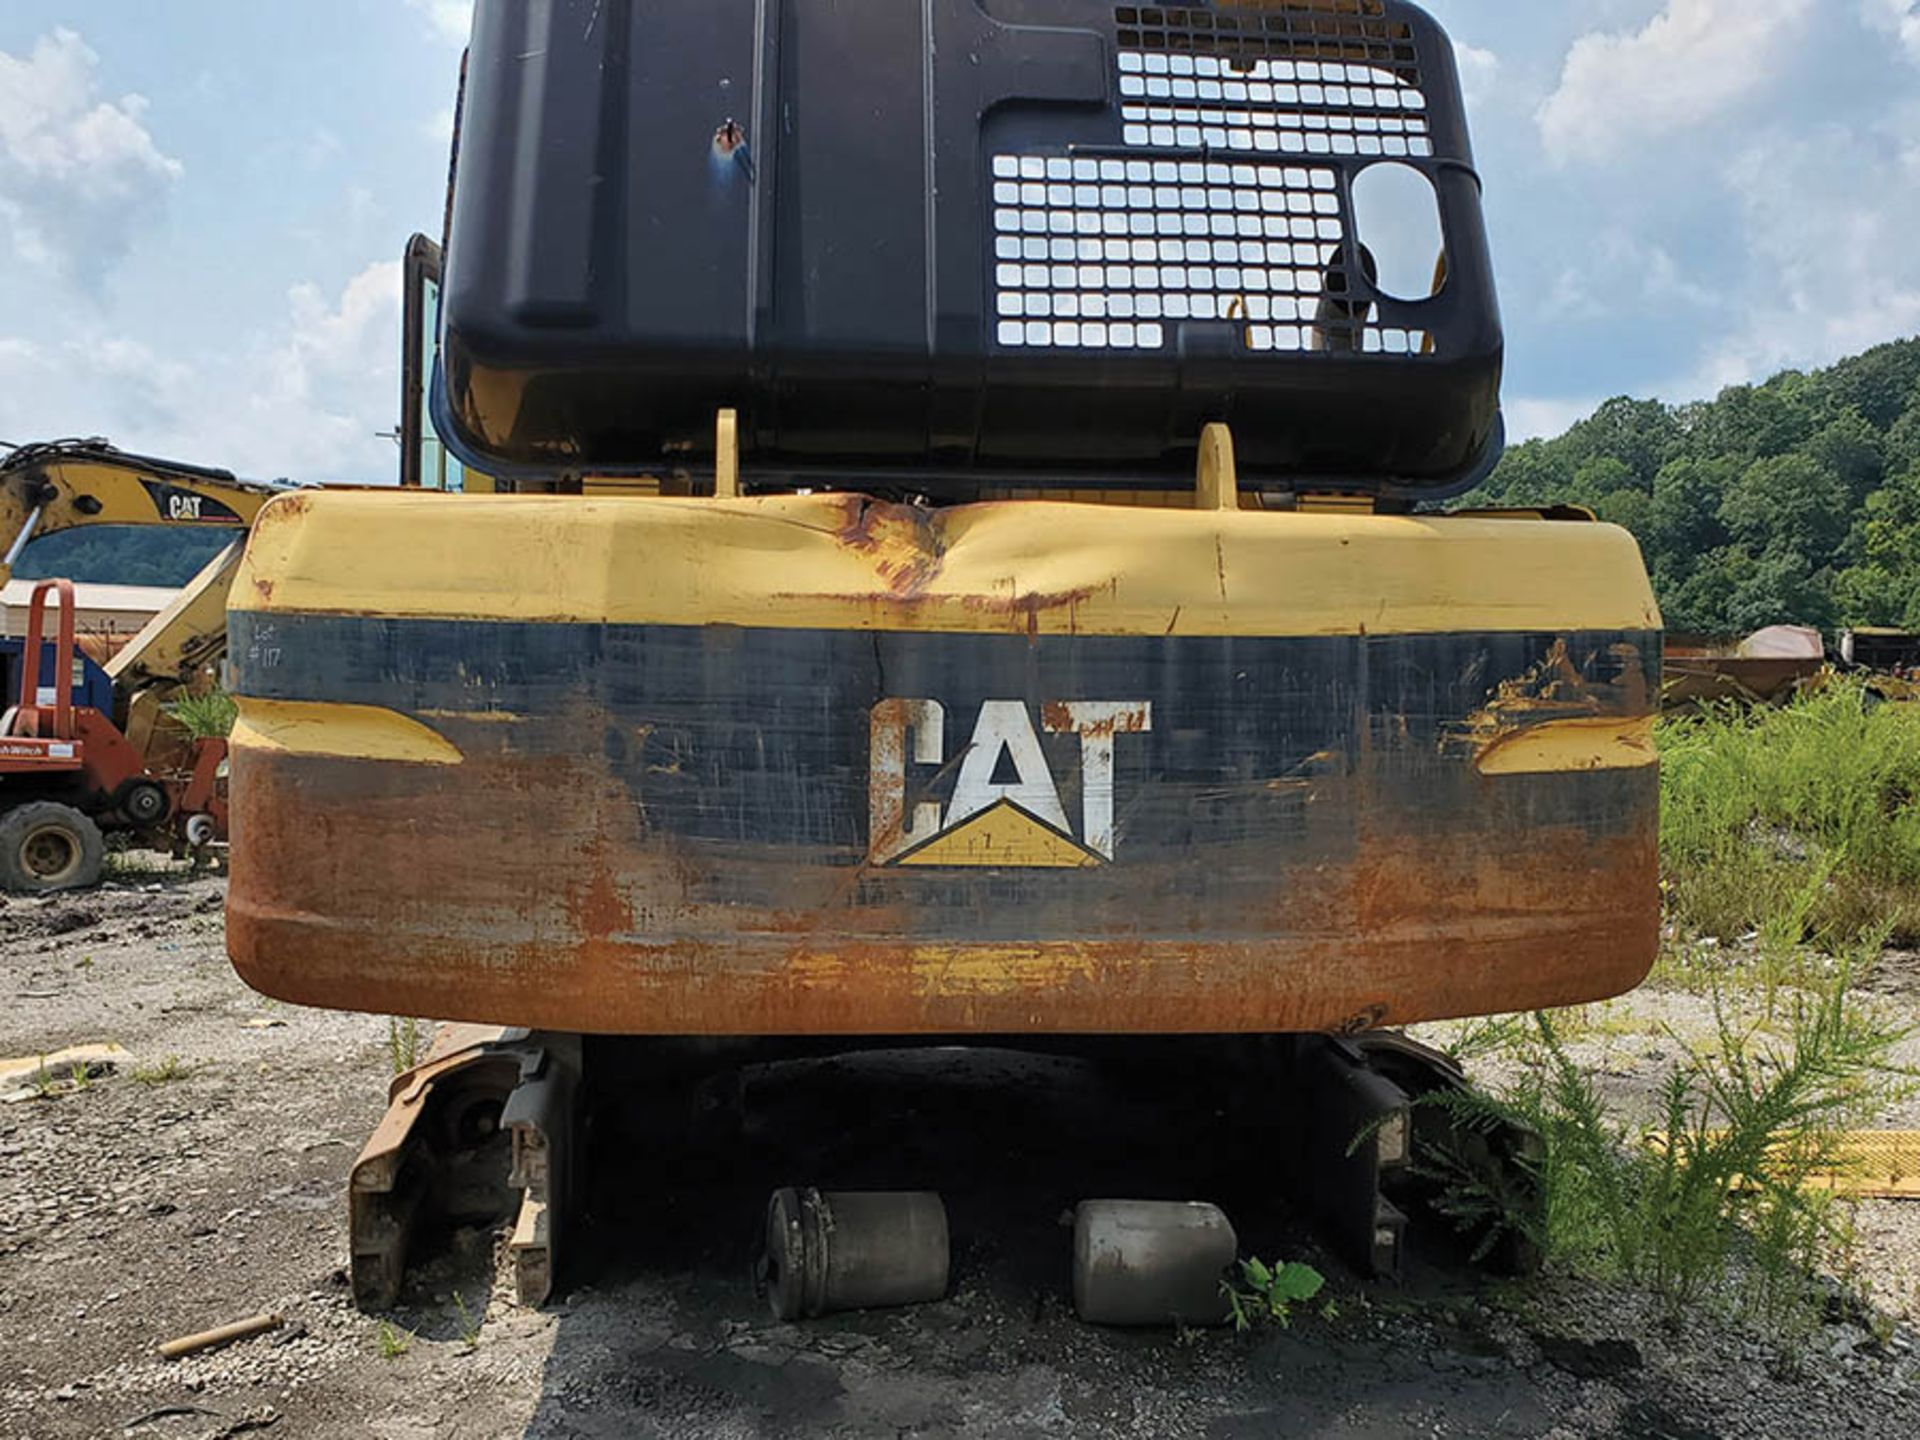 Lot 117 - CATERPILLAR 330BL EXCAVATOR, S/N: 6DR04325, 50'' BUCKET WITH TEETH, CAT 3306 DIESEL ENGINE,